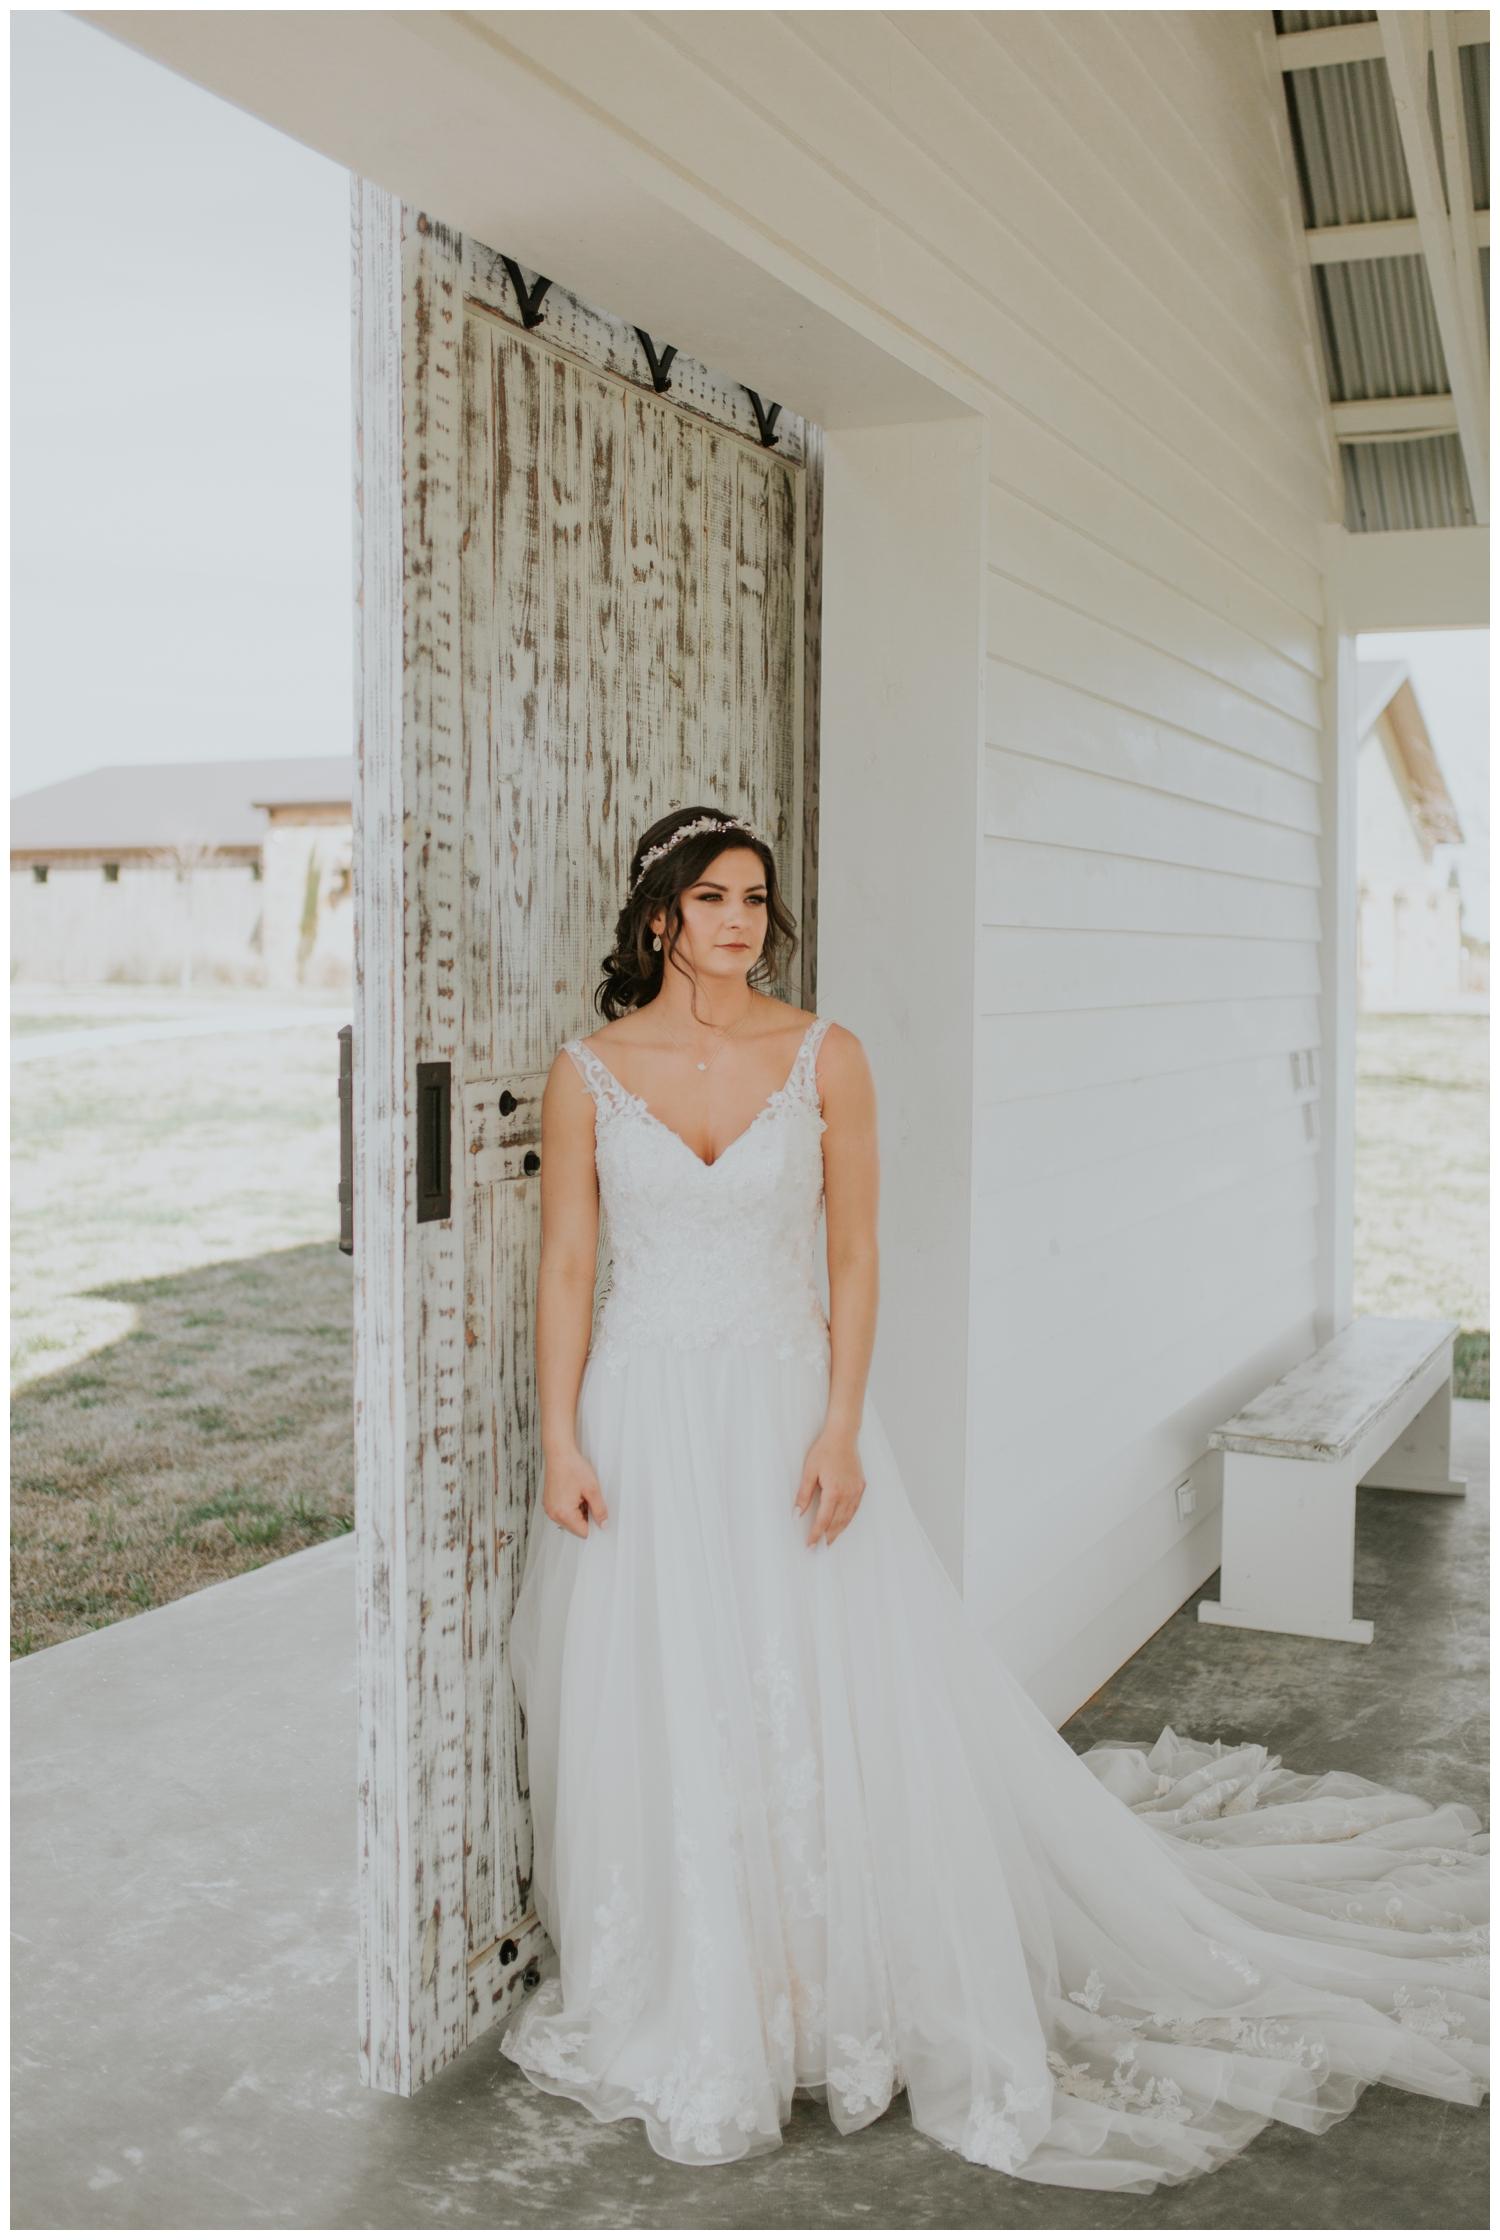 Ashlee+Mike, Featherstone Ranch Spring Wedding, San Antonio, Contista Productions Wedding Photography_0001.jpg